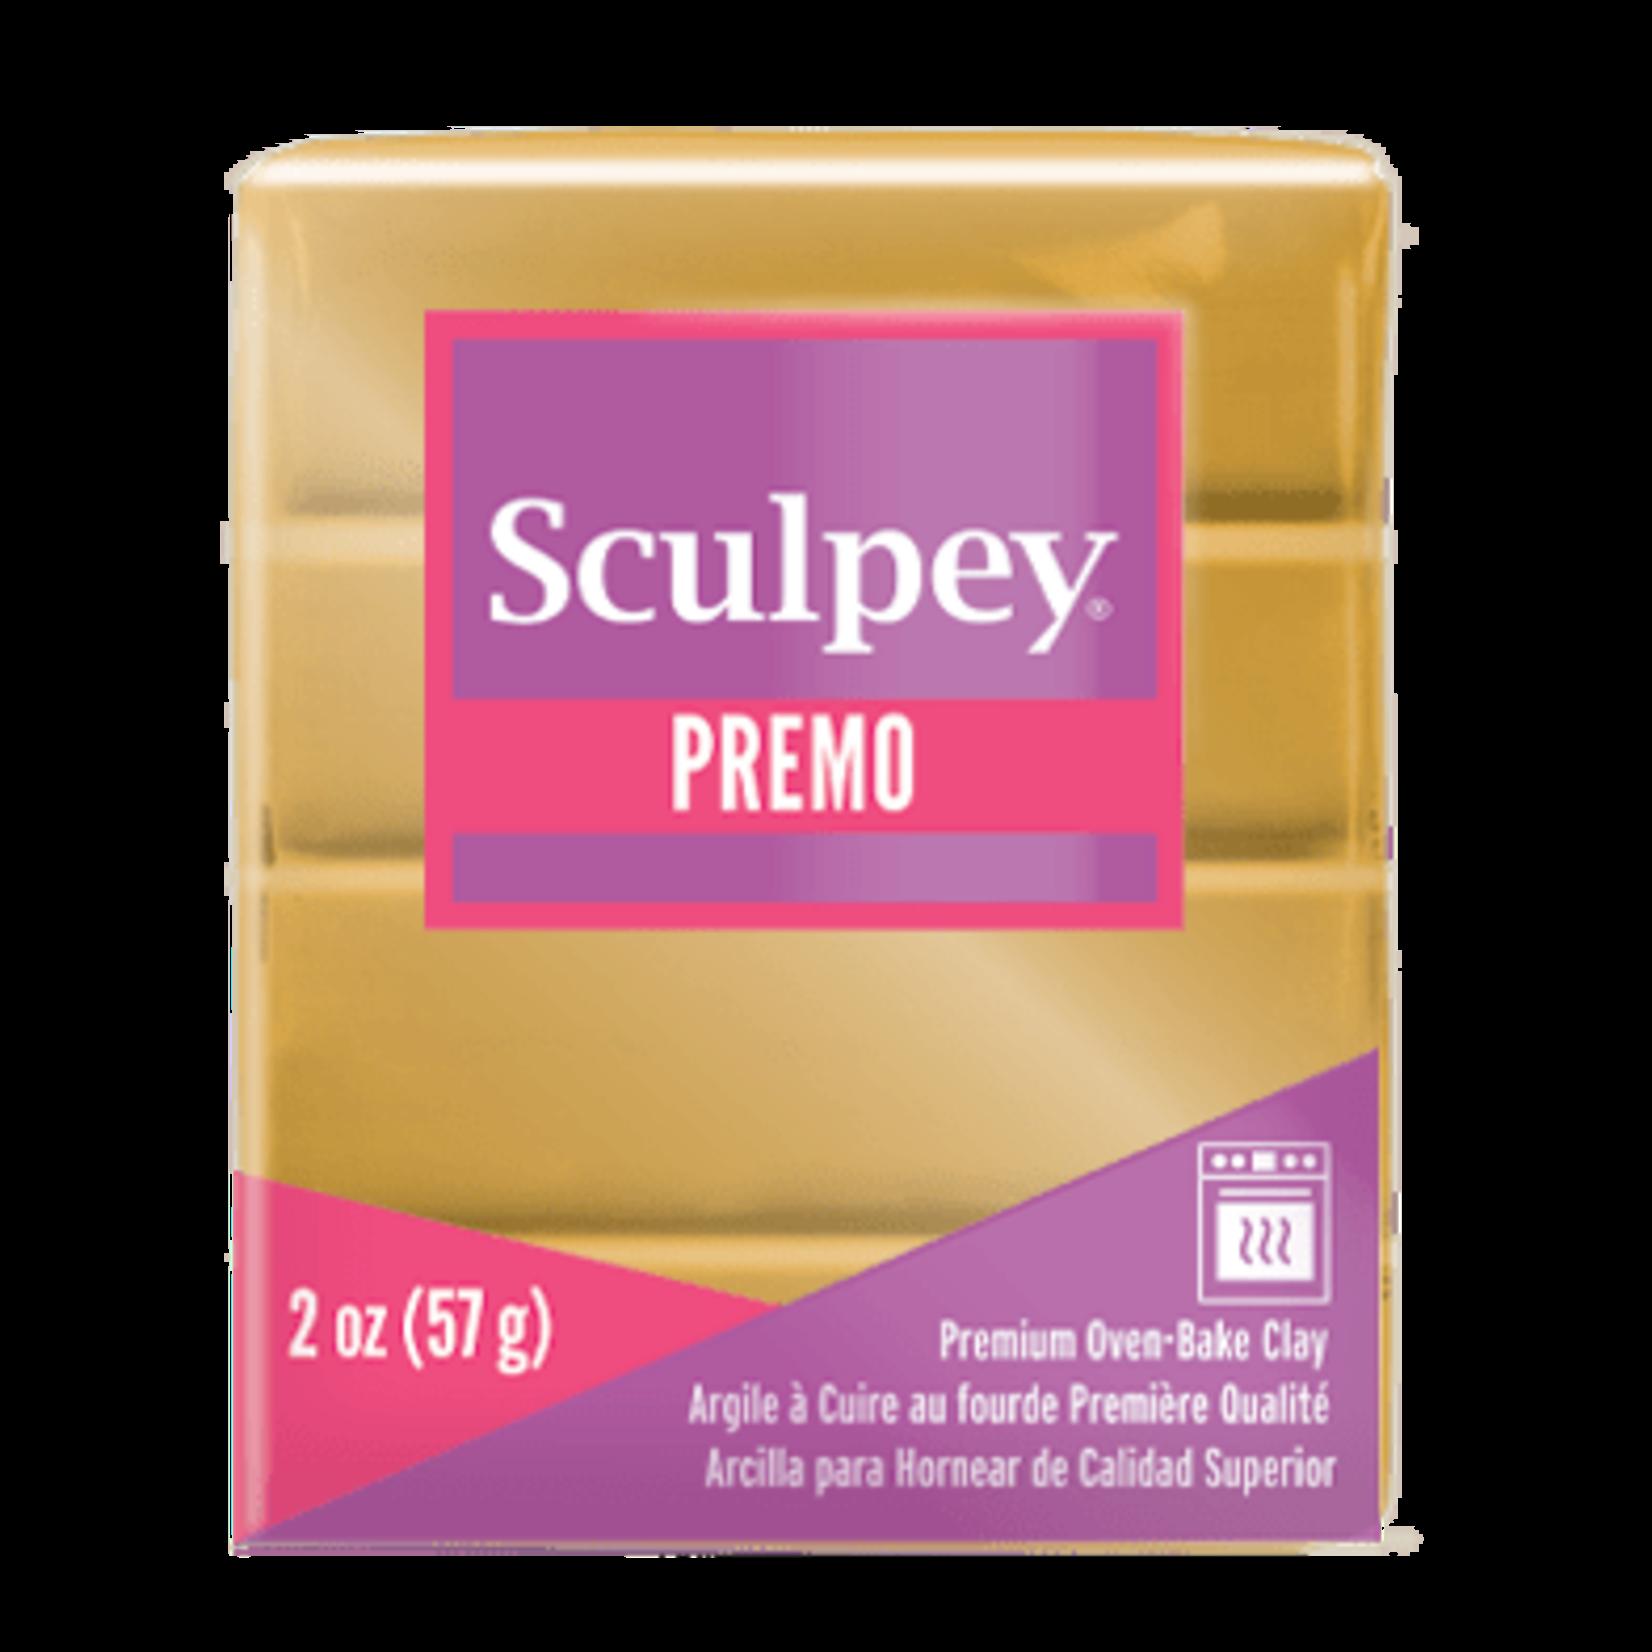 Sculpey Sculpey Premo   -- 18K Gold